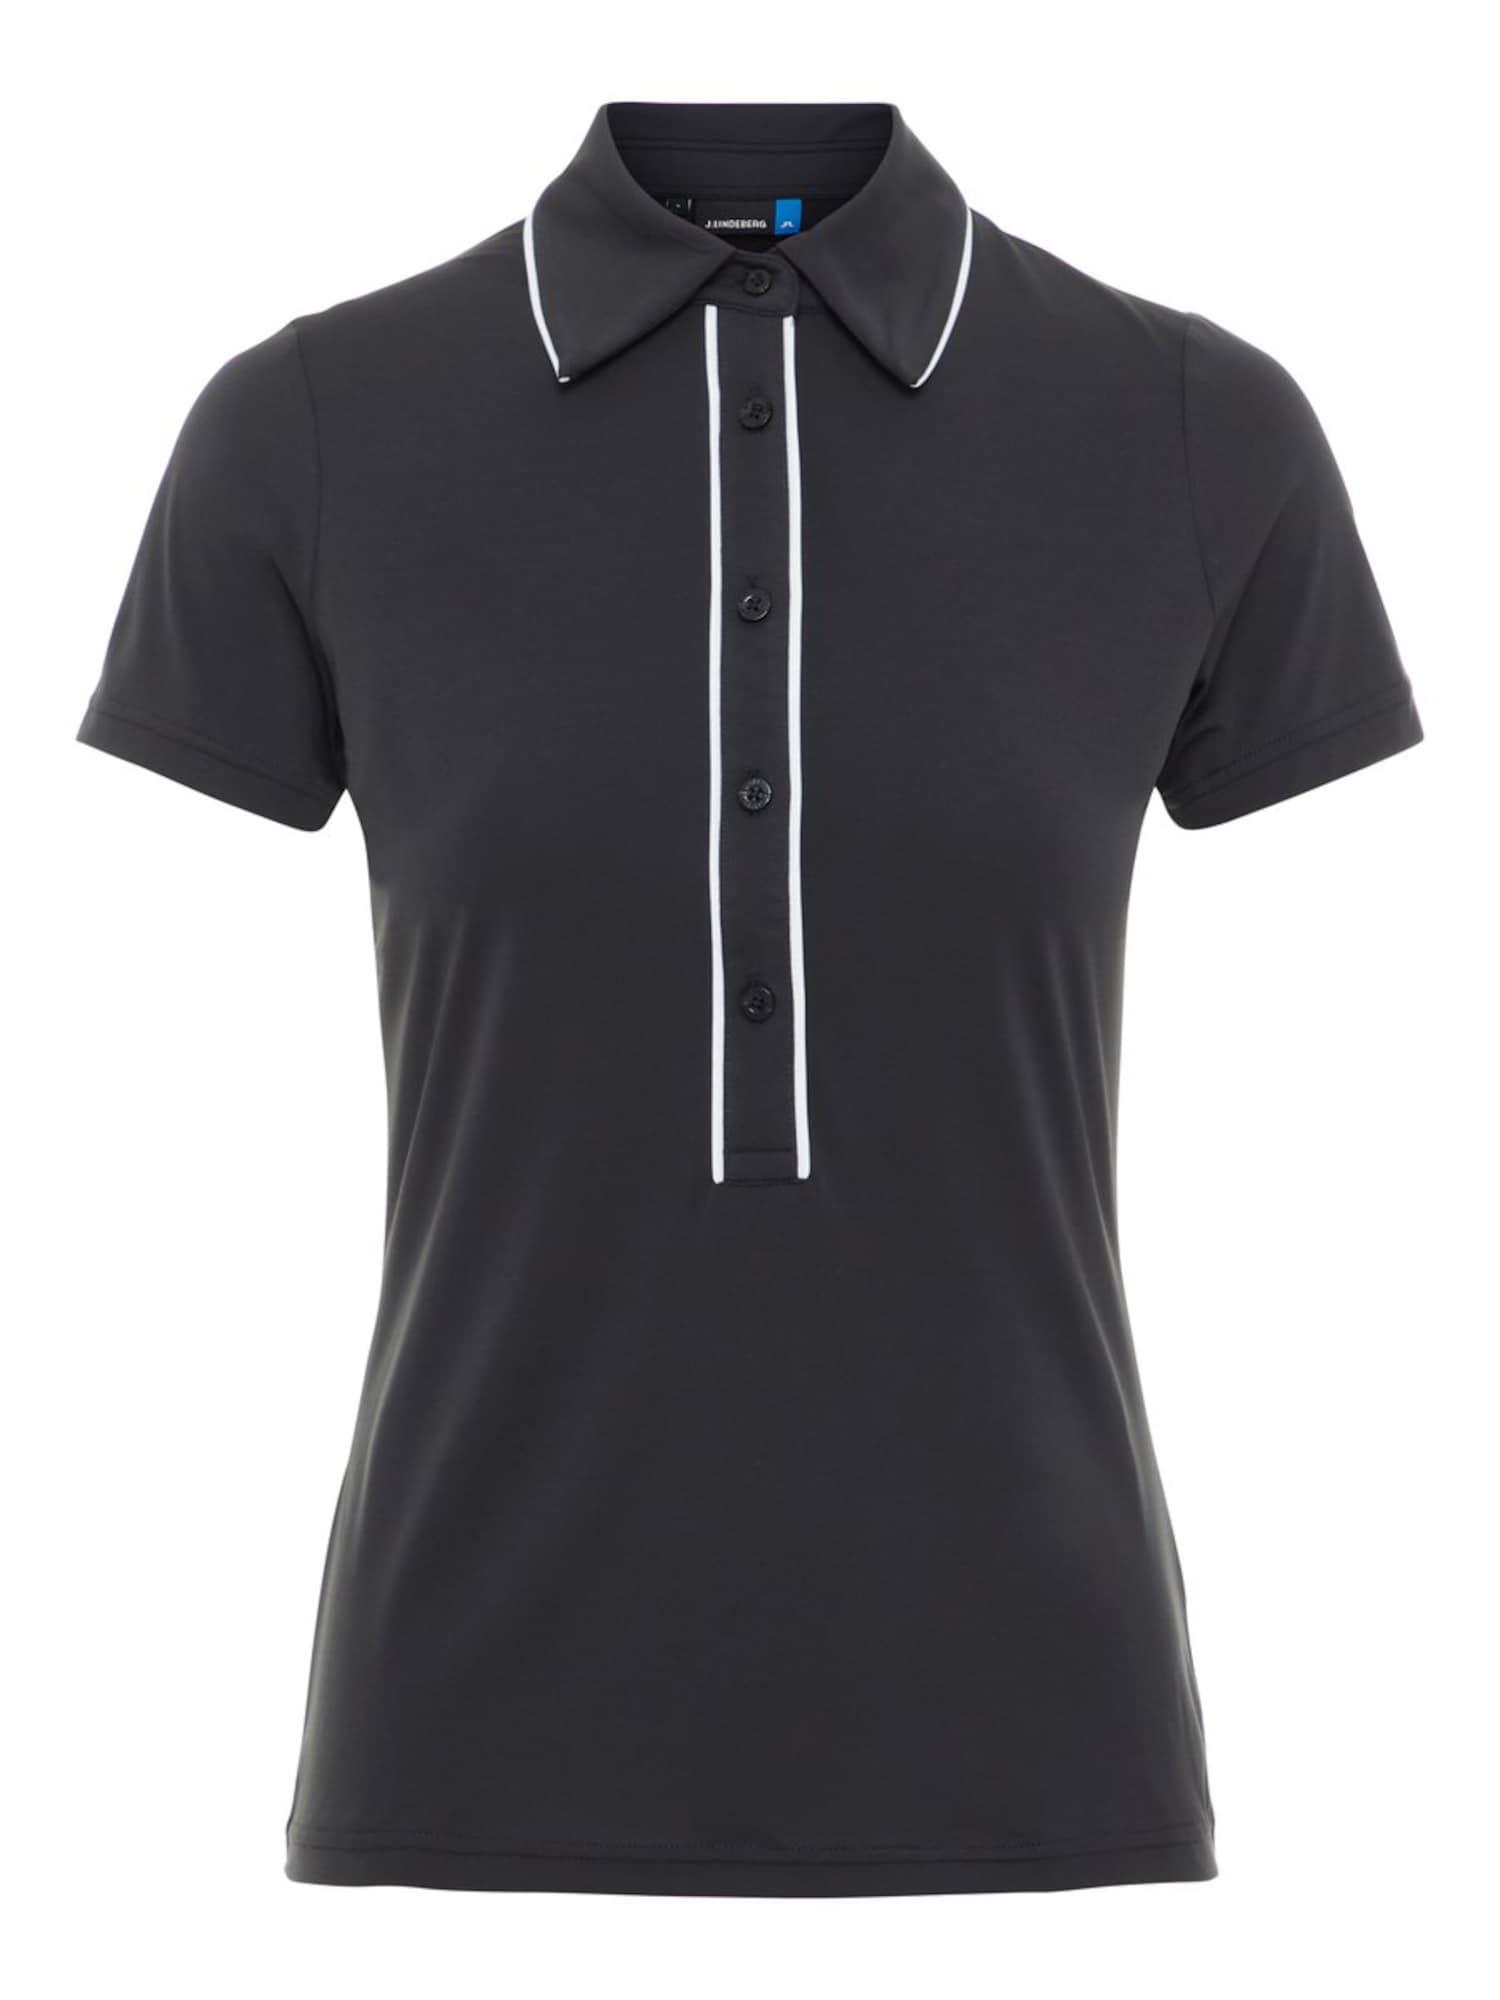 Poloshirt 'Flor' | Bekleidung > Shirts > Poloshirts | Schwarz - Weiß | J.Lindeberg